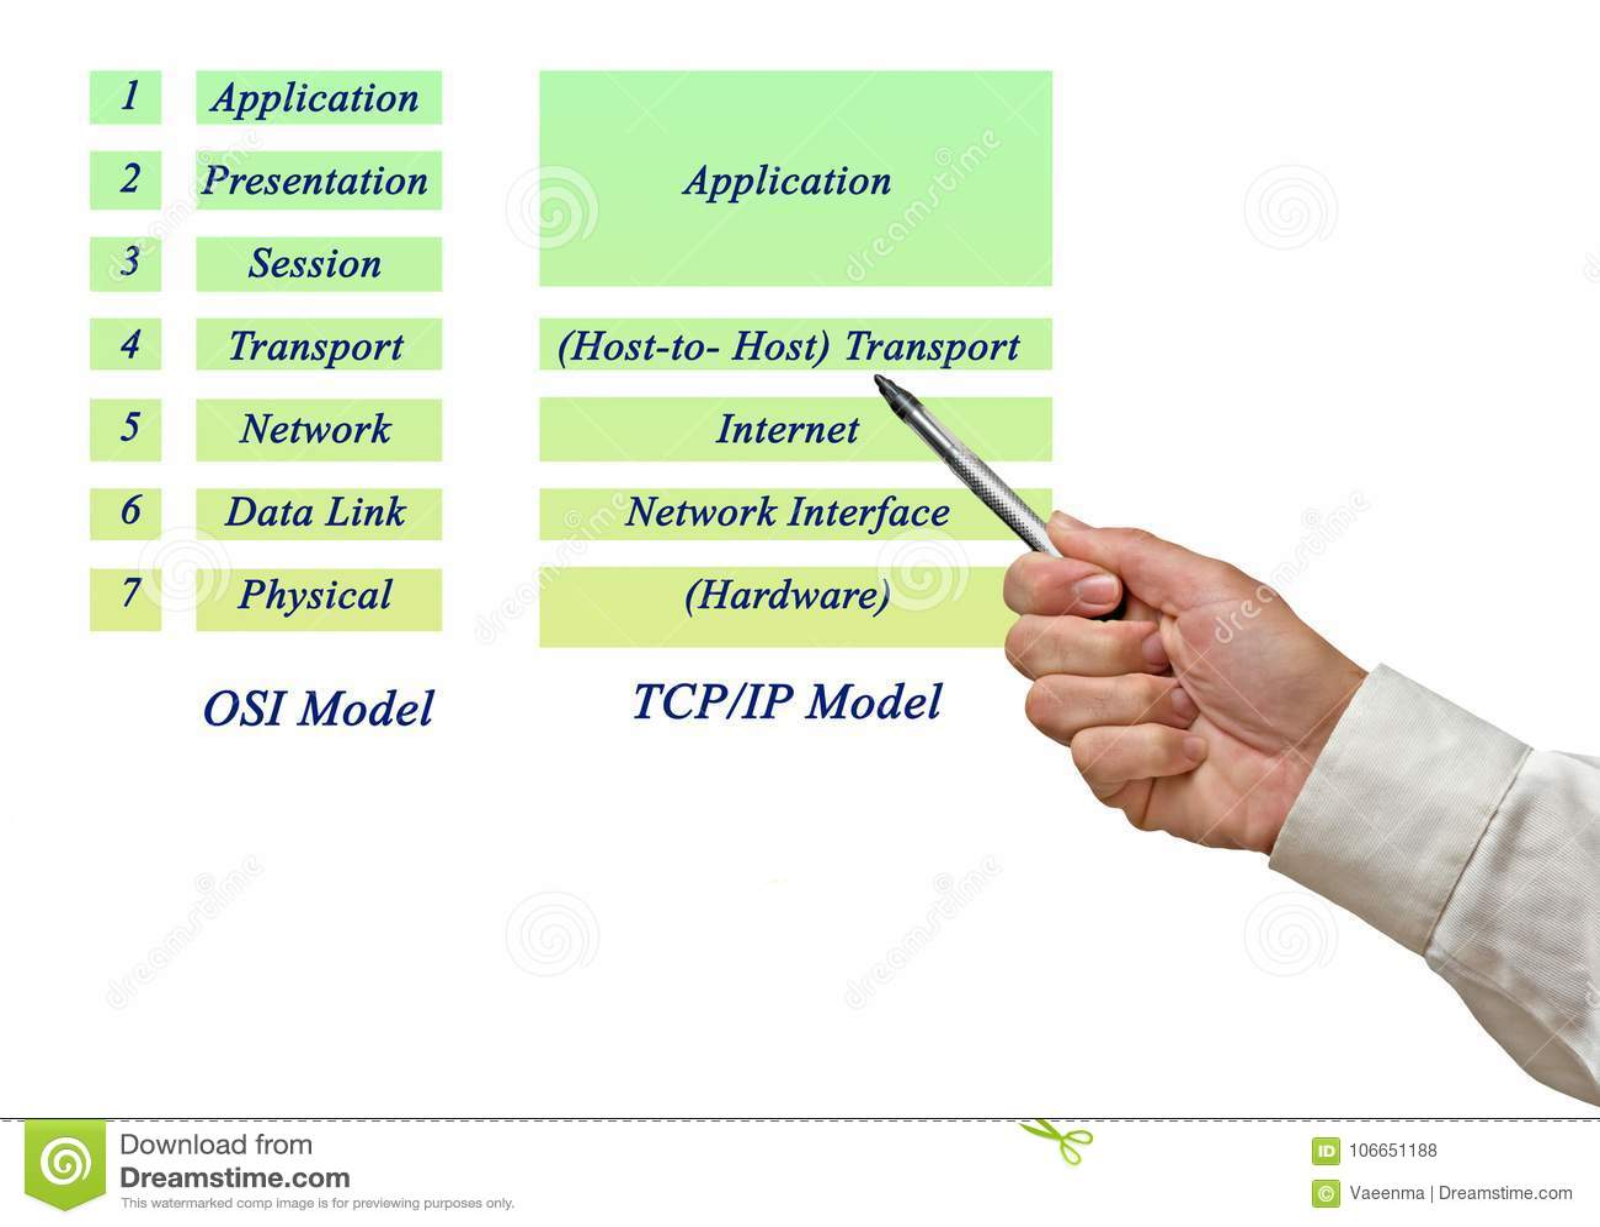 Osi reference model e modelo layers do tcpip foto de stock imagem download osi reference model e modelo layers do tcpip foto de stock imagem ccuart Image collections